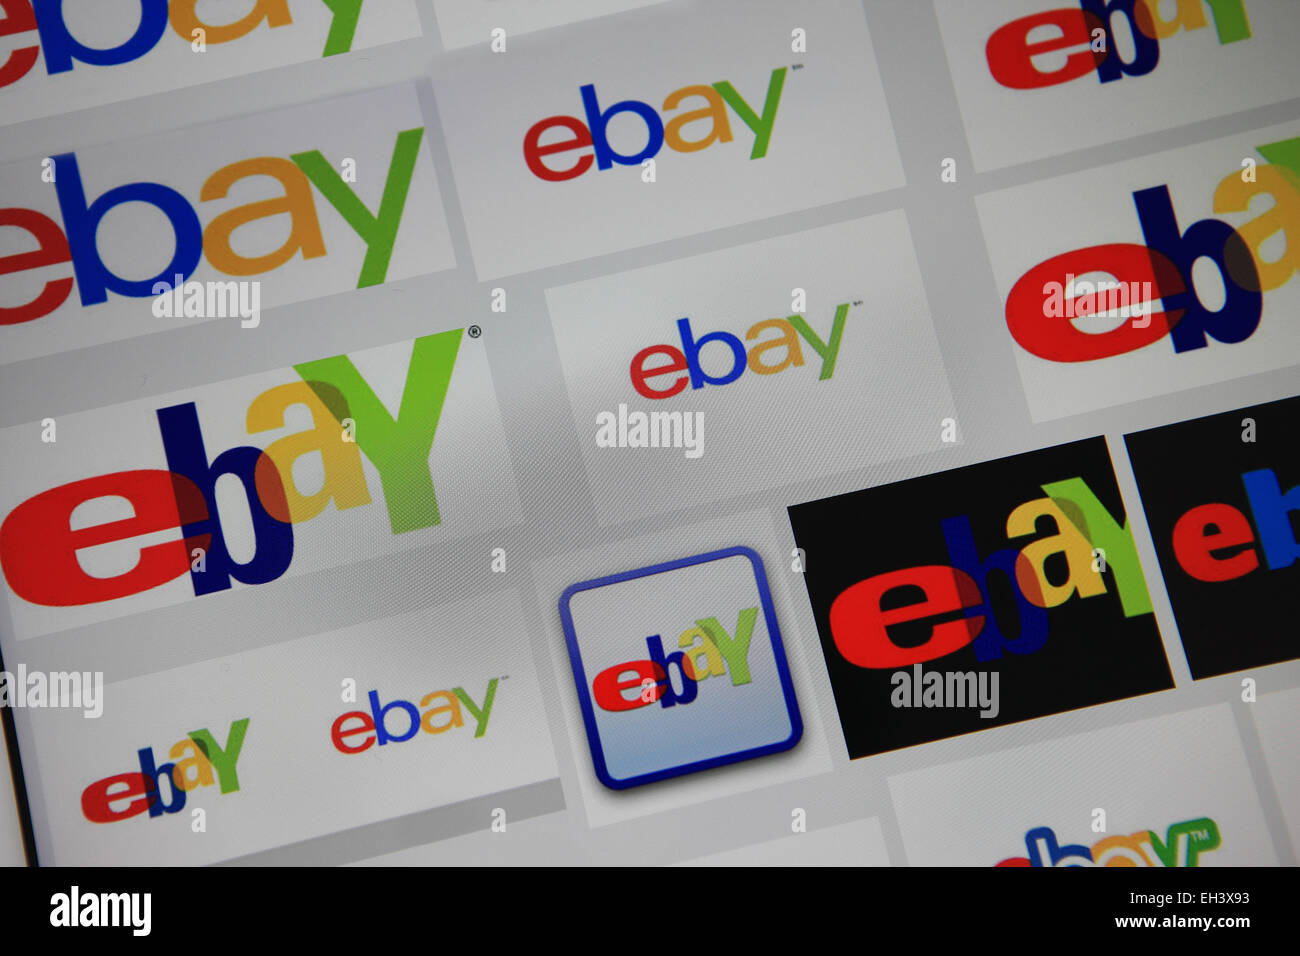 Ebay logos - Stock Image